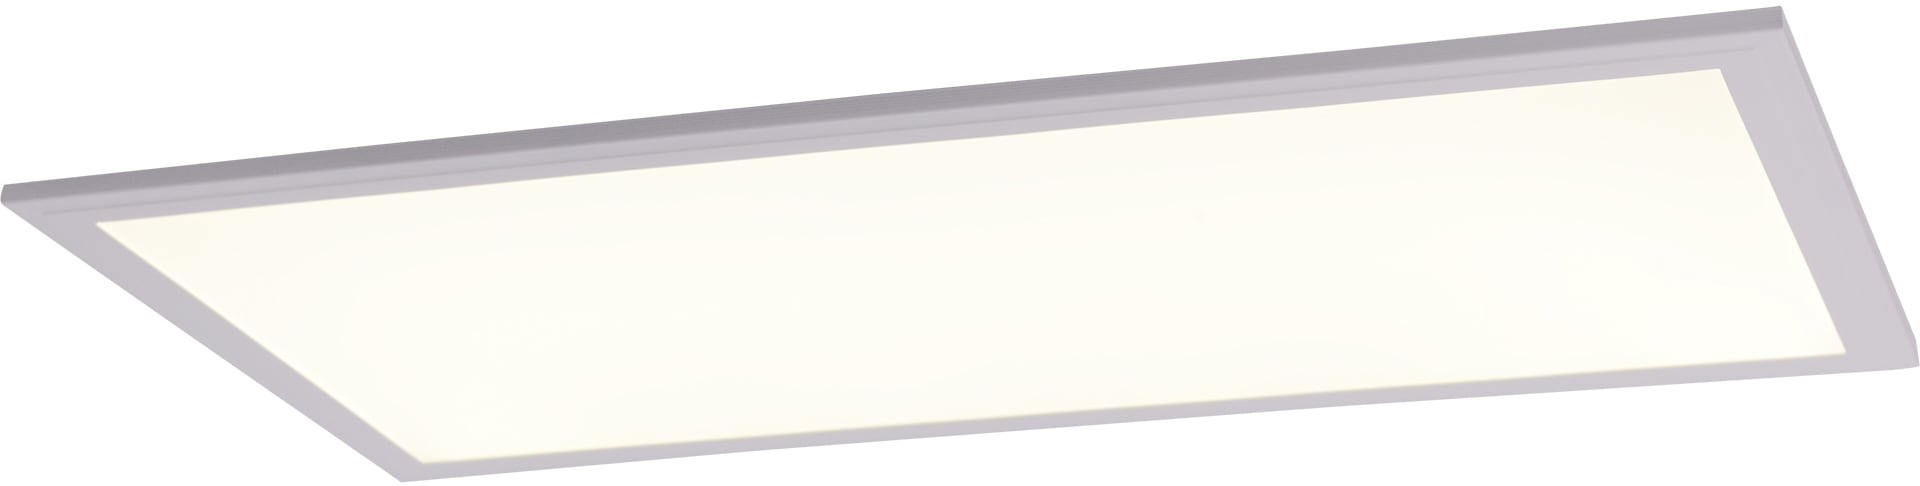 näve LED Deckenleuchte Mondera, LED-Board, Neutralweiß, LED Deckenlampe